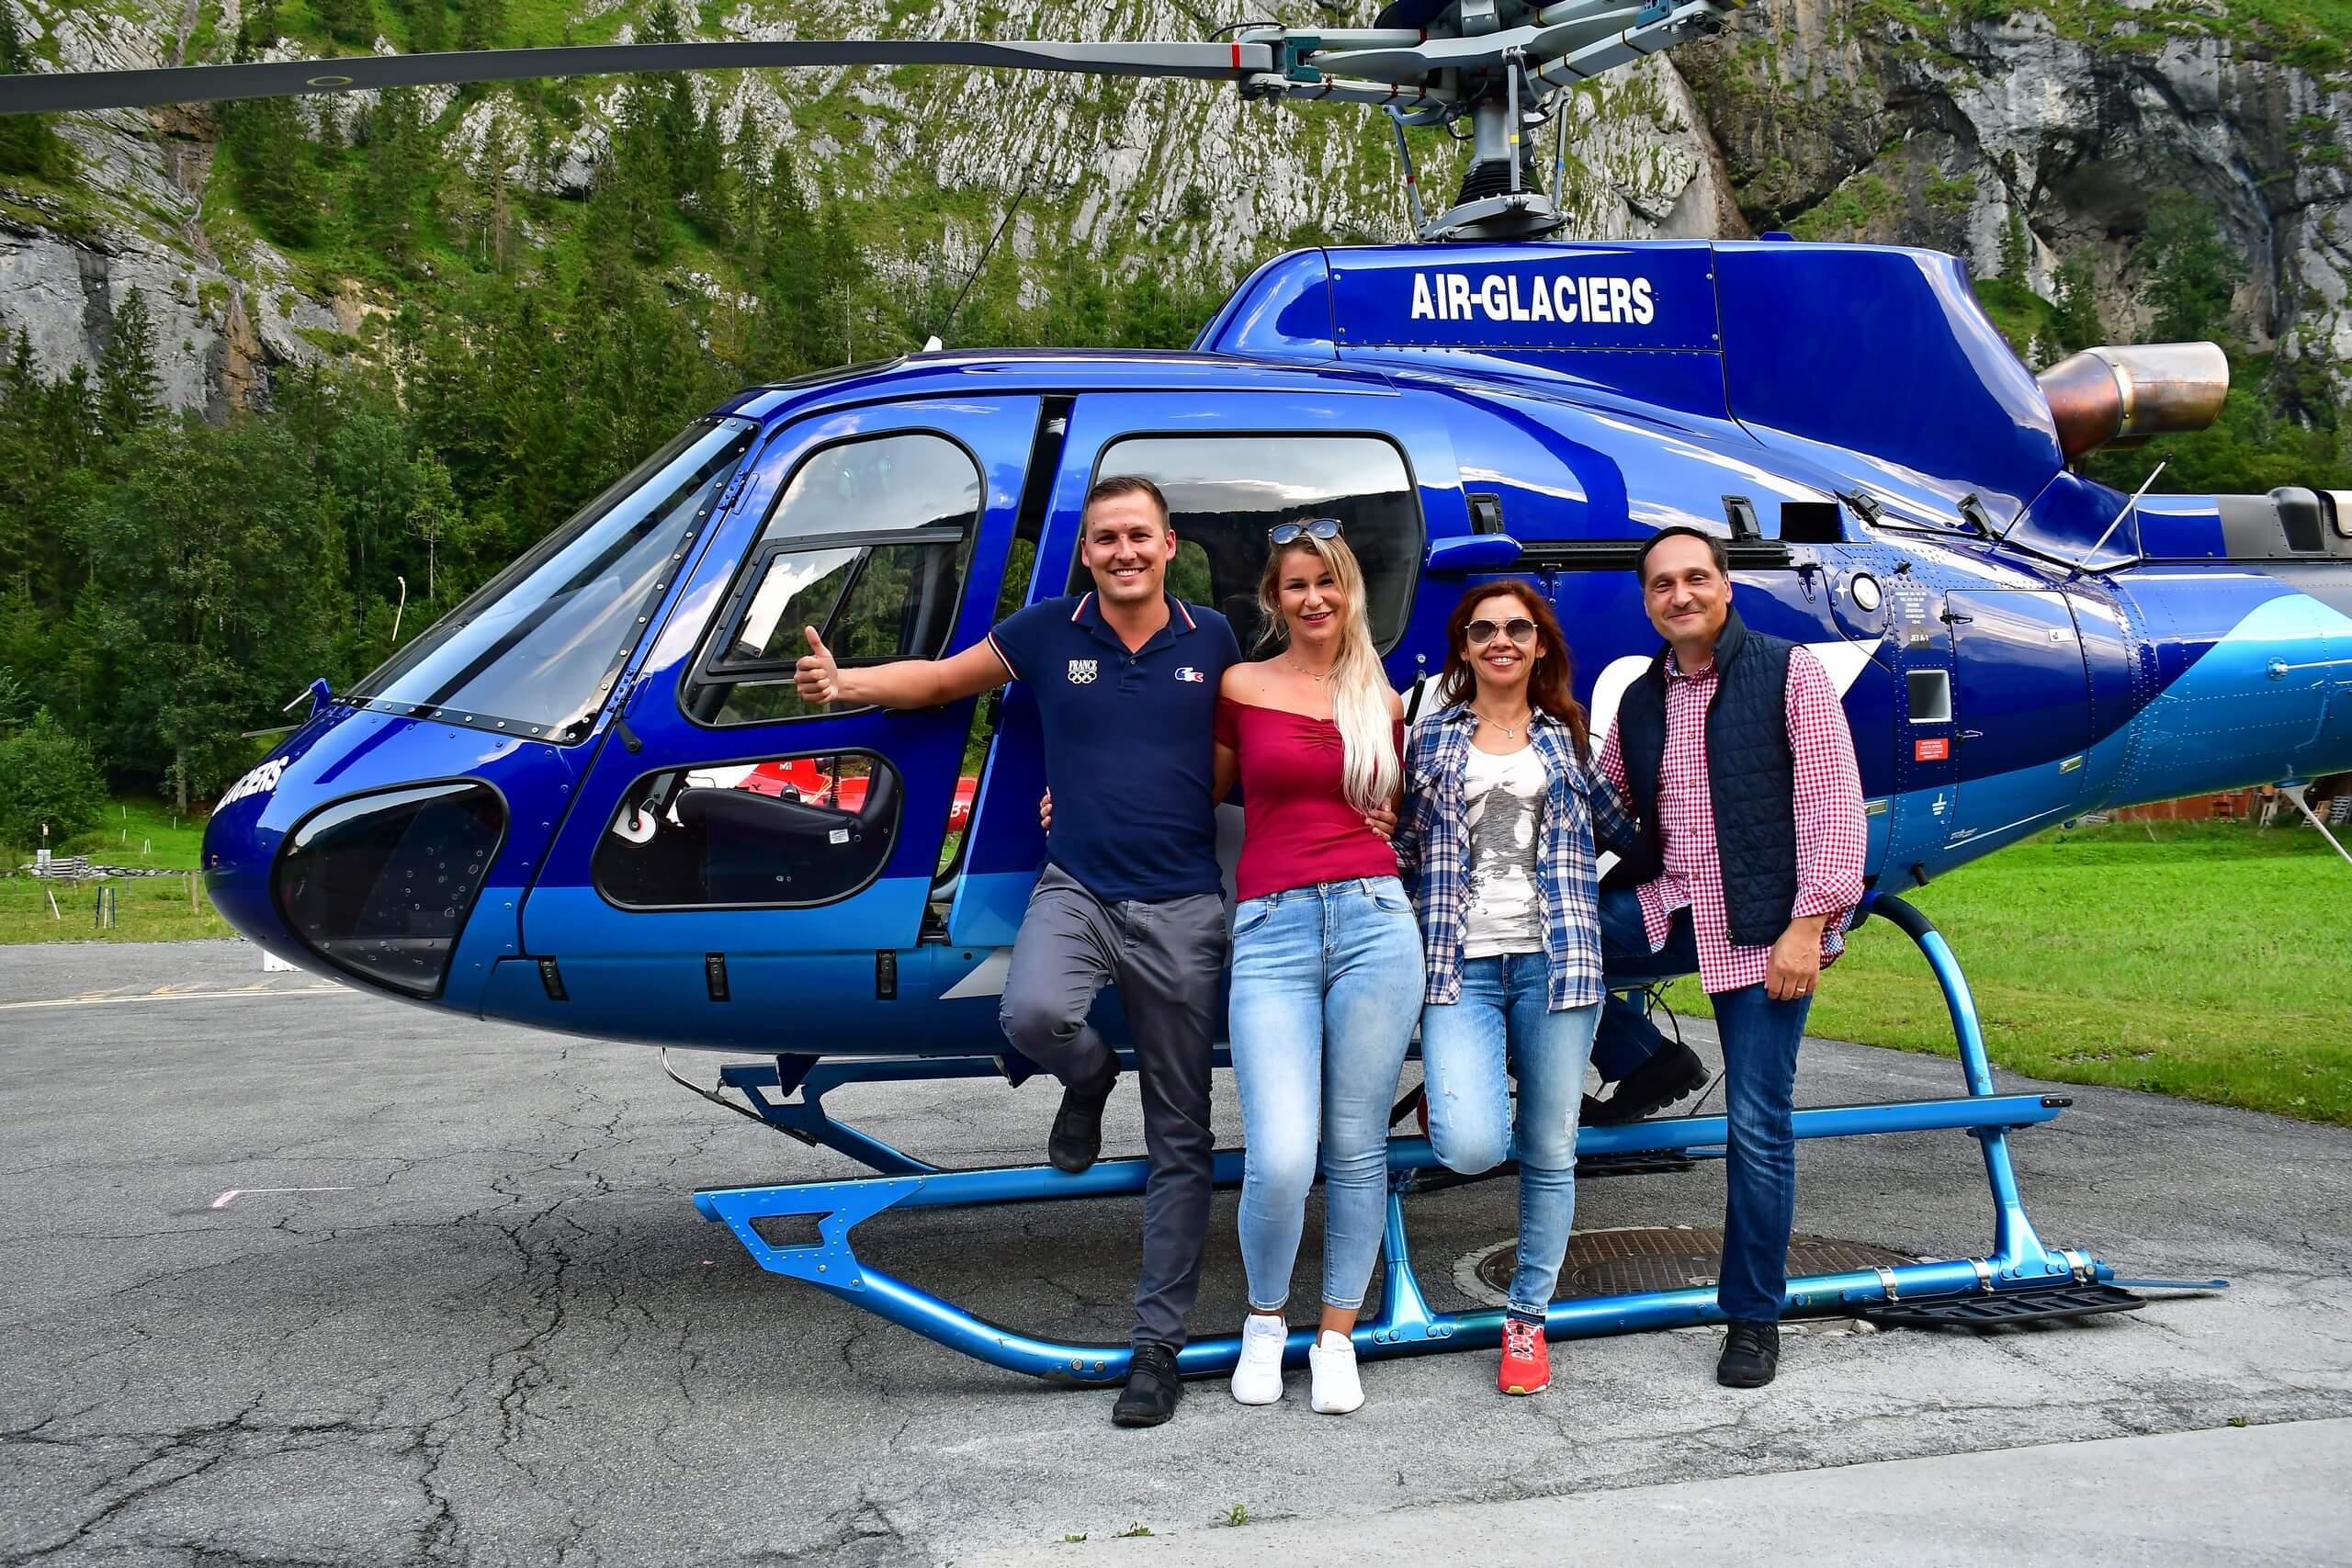 jungfrau-tours-gaeste-helikopter